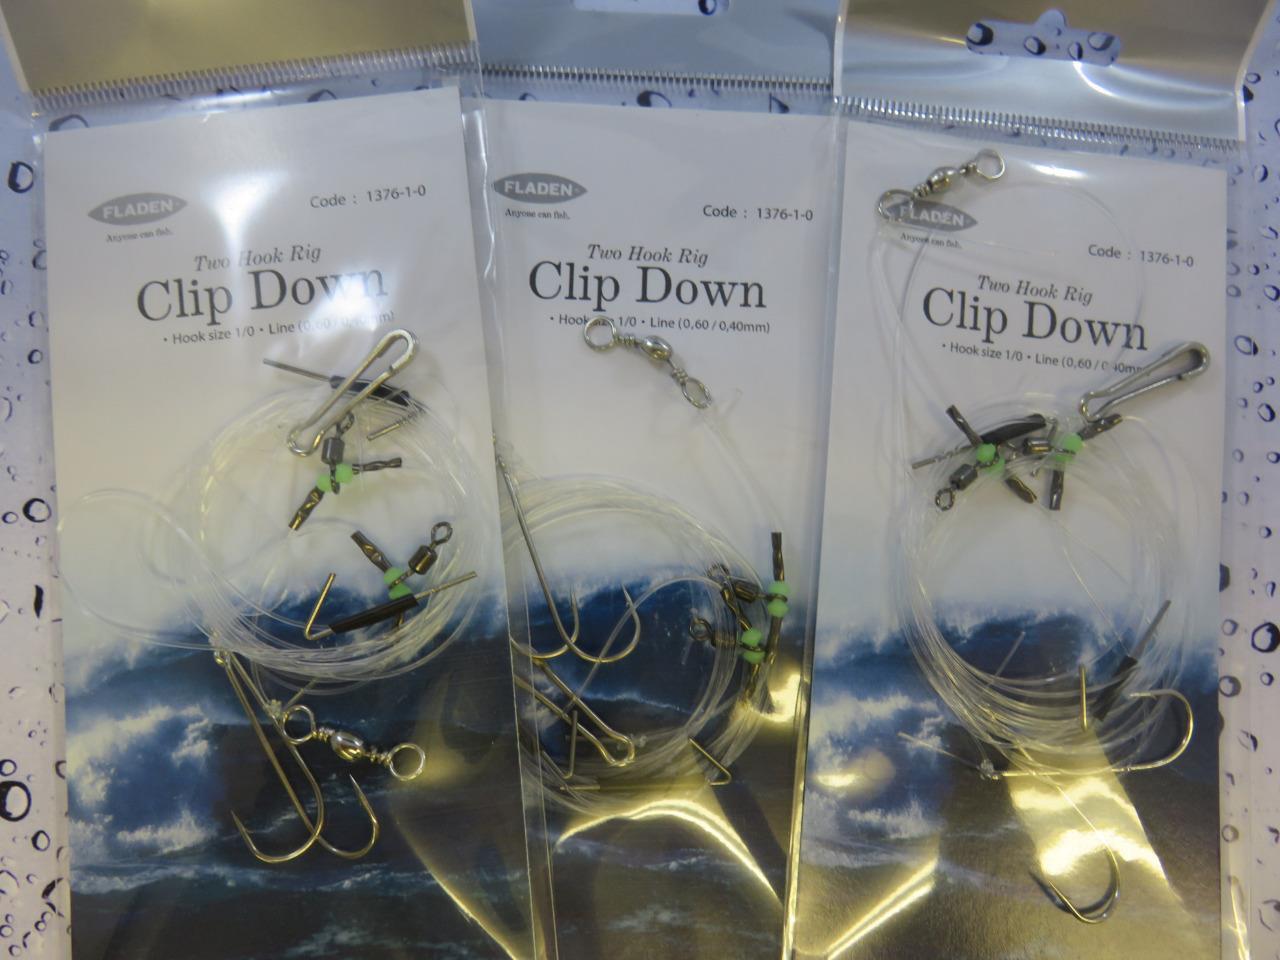 3 x Fladen 2 Down Crochet Clip Down 2 Rig Sz 1/0 Pour Mer Bateau Quai Plage Rock Fishing 7f9408